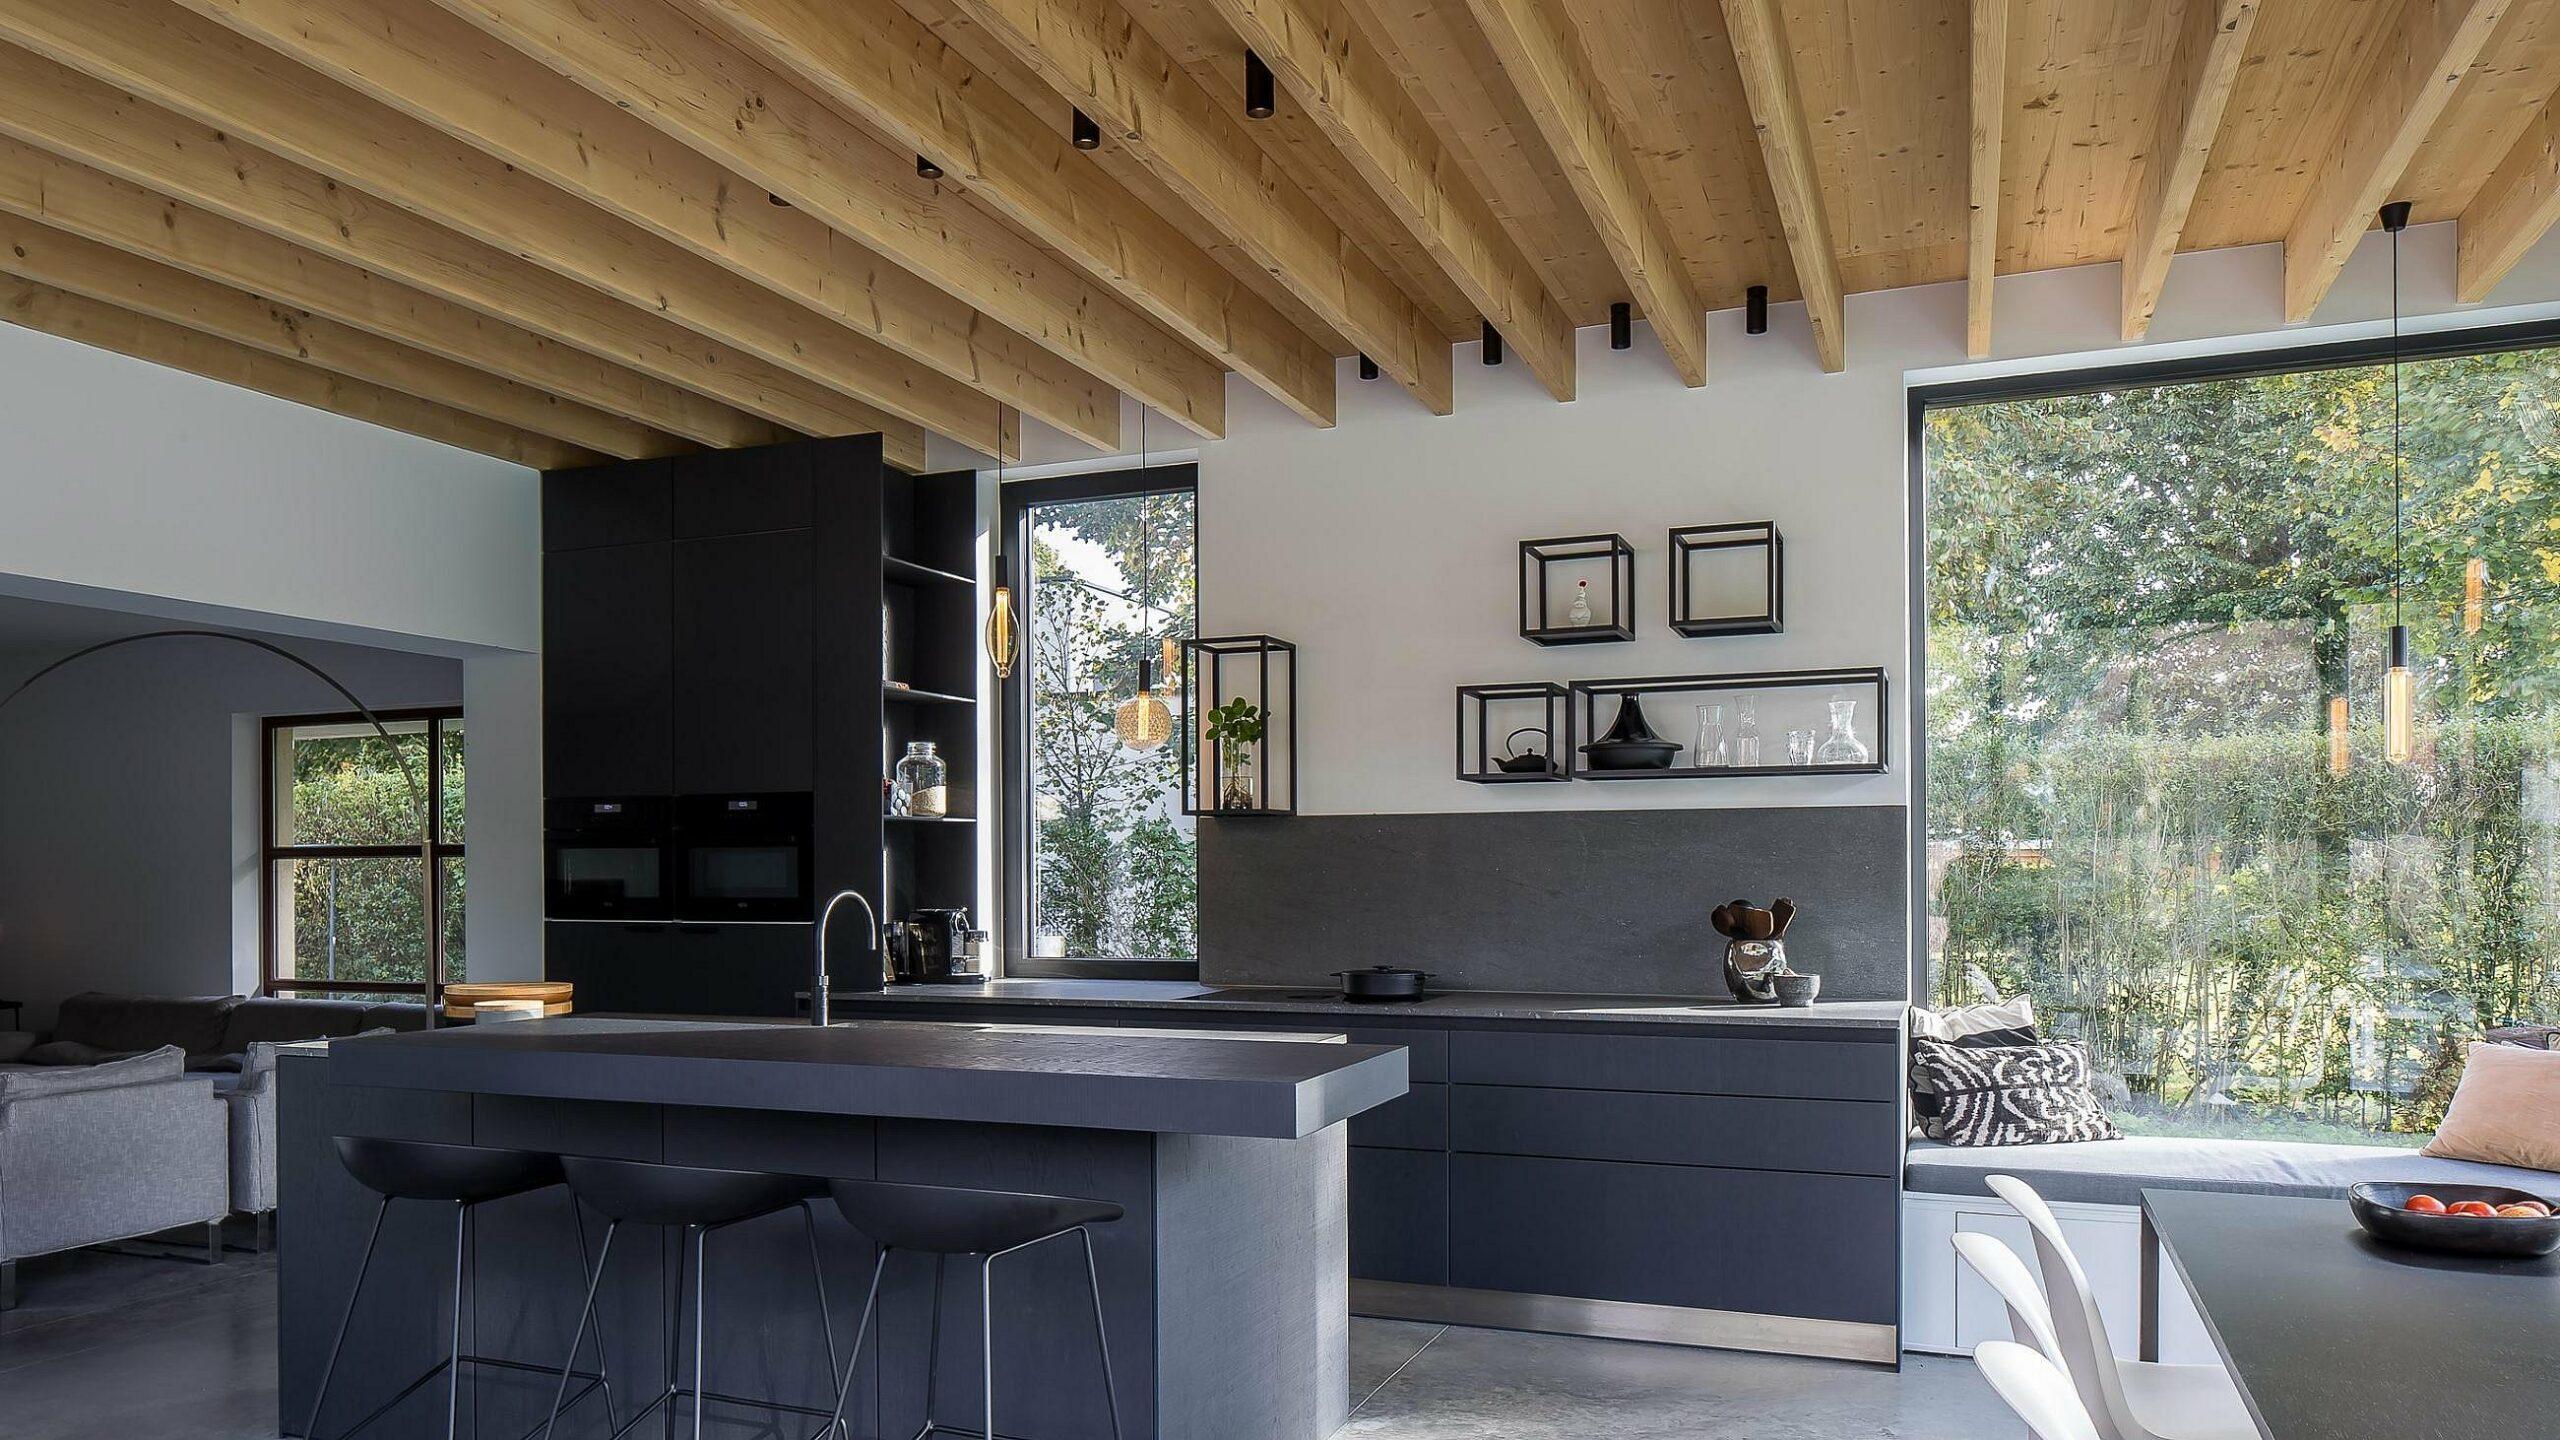 csm bulthaup ligna recta cafeine black oak 11 6588962077 1 scaled | Baeyens & Beck architecten Gent | architect nieuwbouw renovatie interieur | high end | architectenbureau